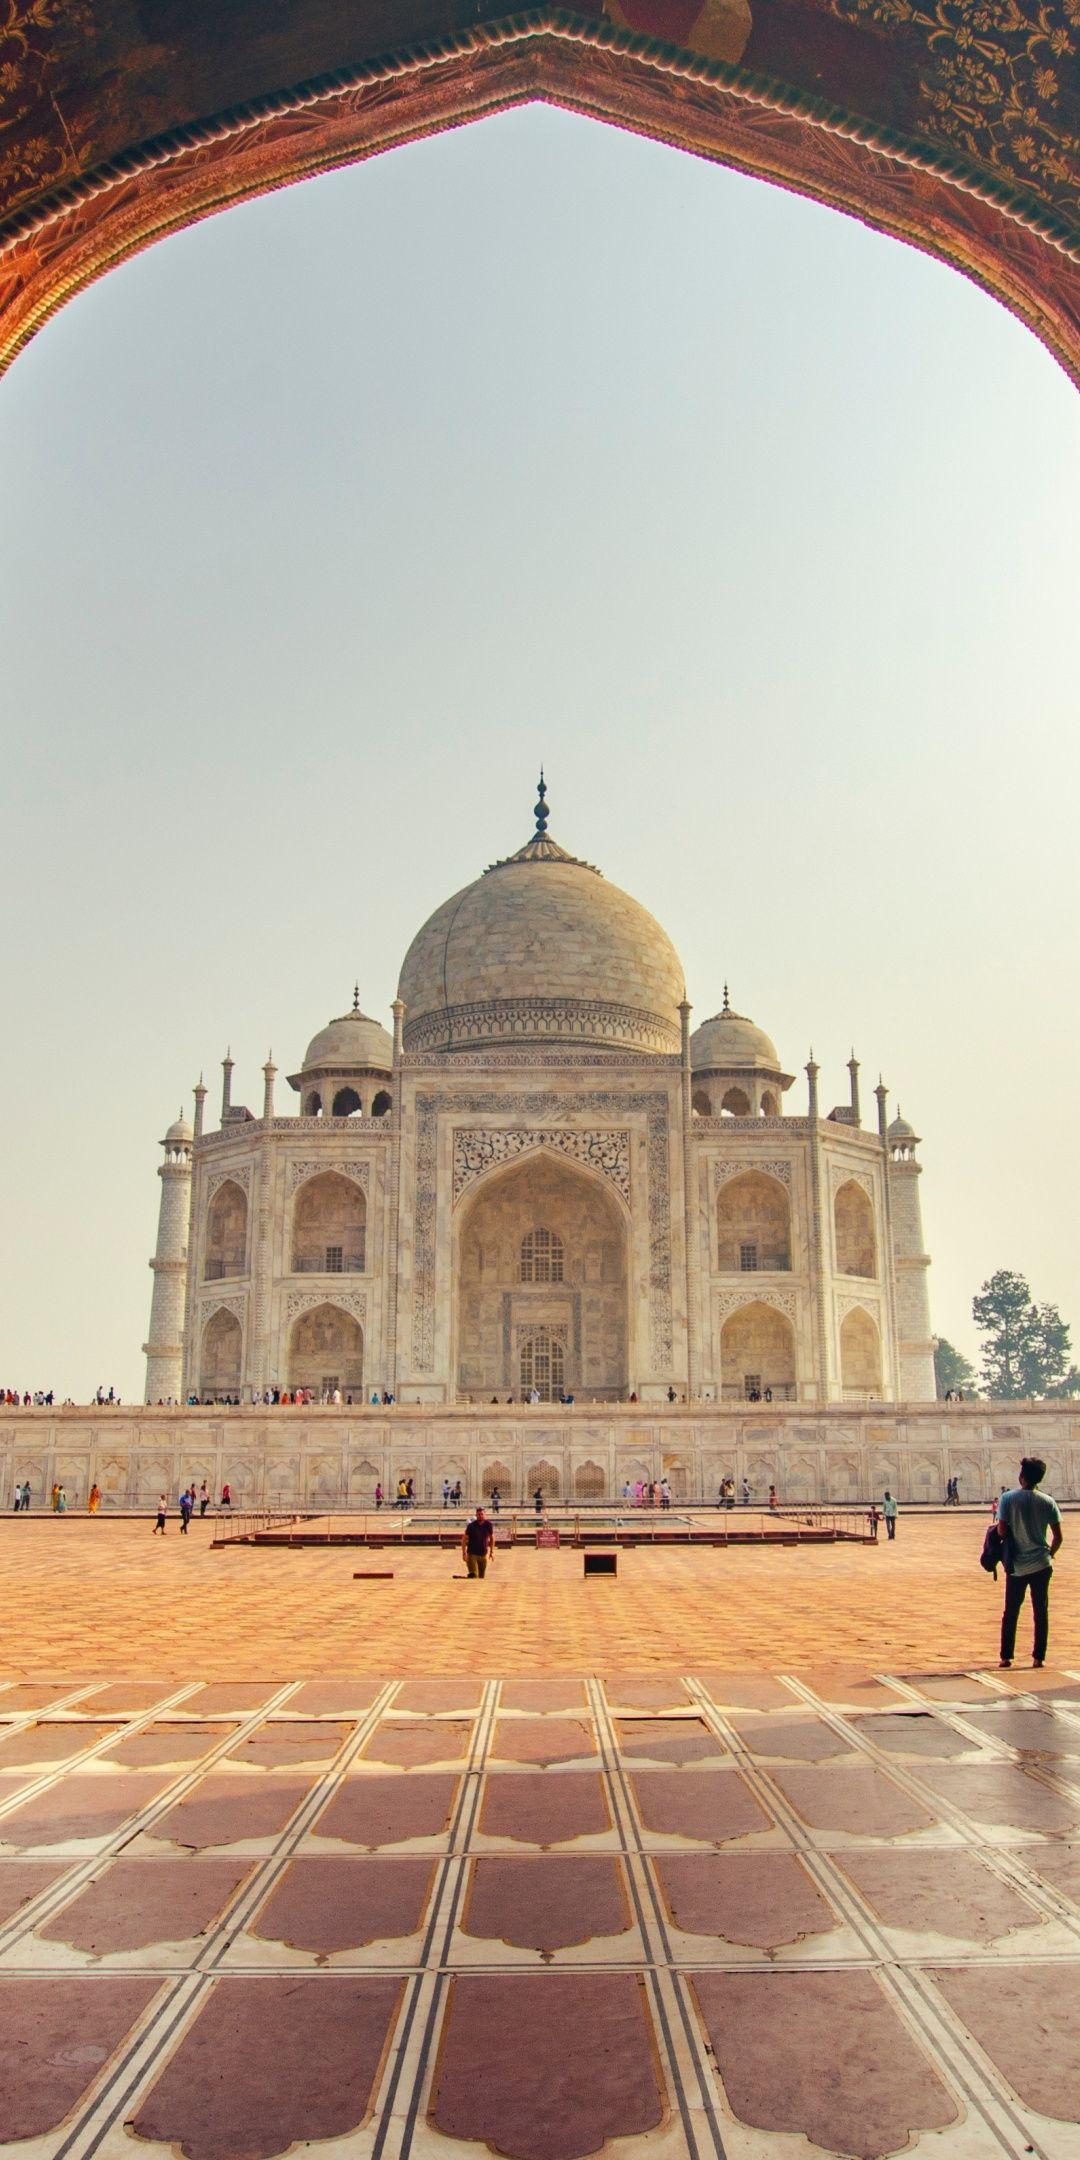 Architecture Taj Mahal New Delhi 1080x2160 Wallpaper Taj Mahal Mecca Wallpaper Cityscape Wallpaper